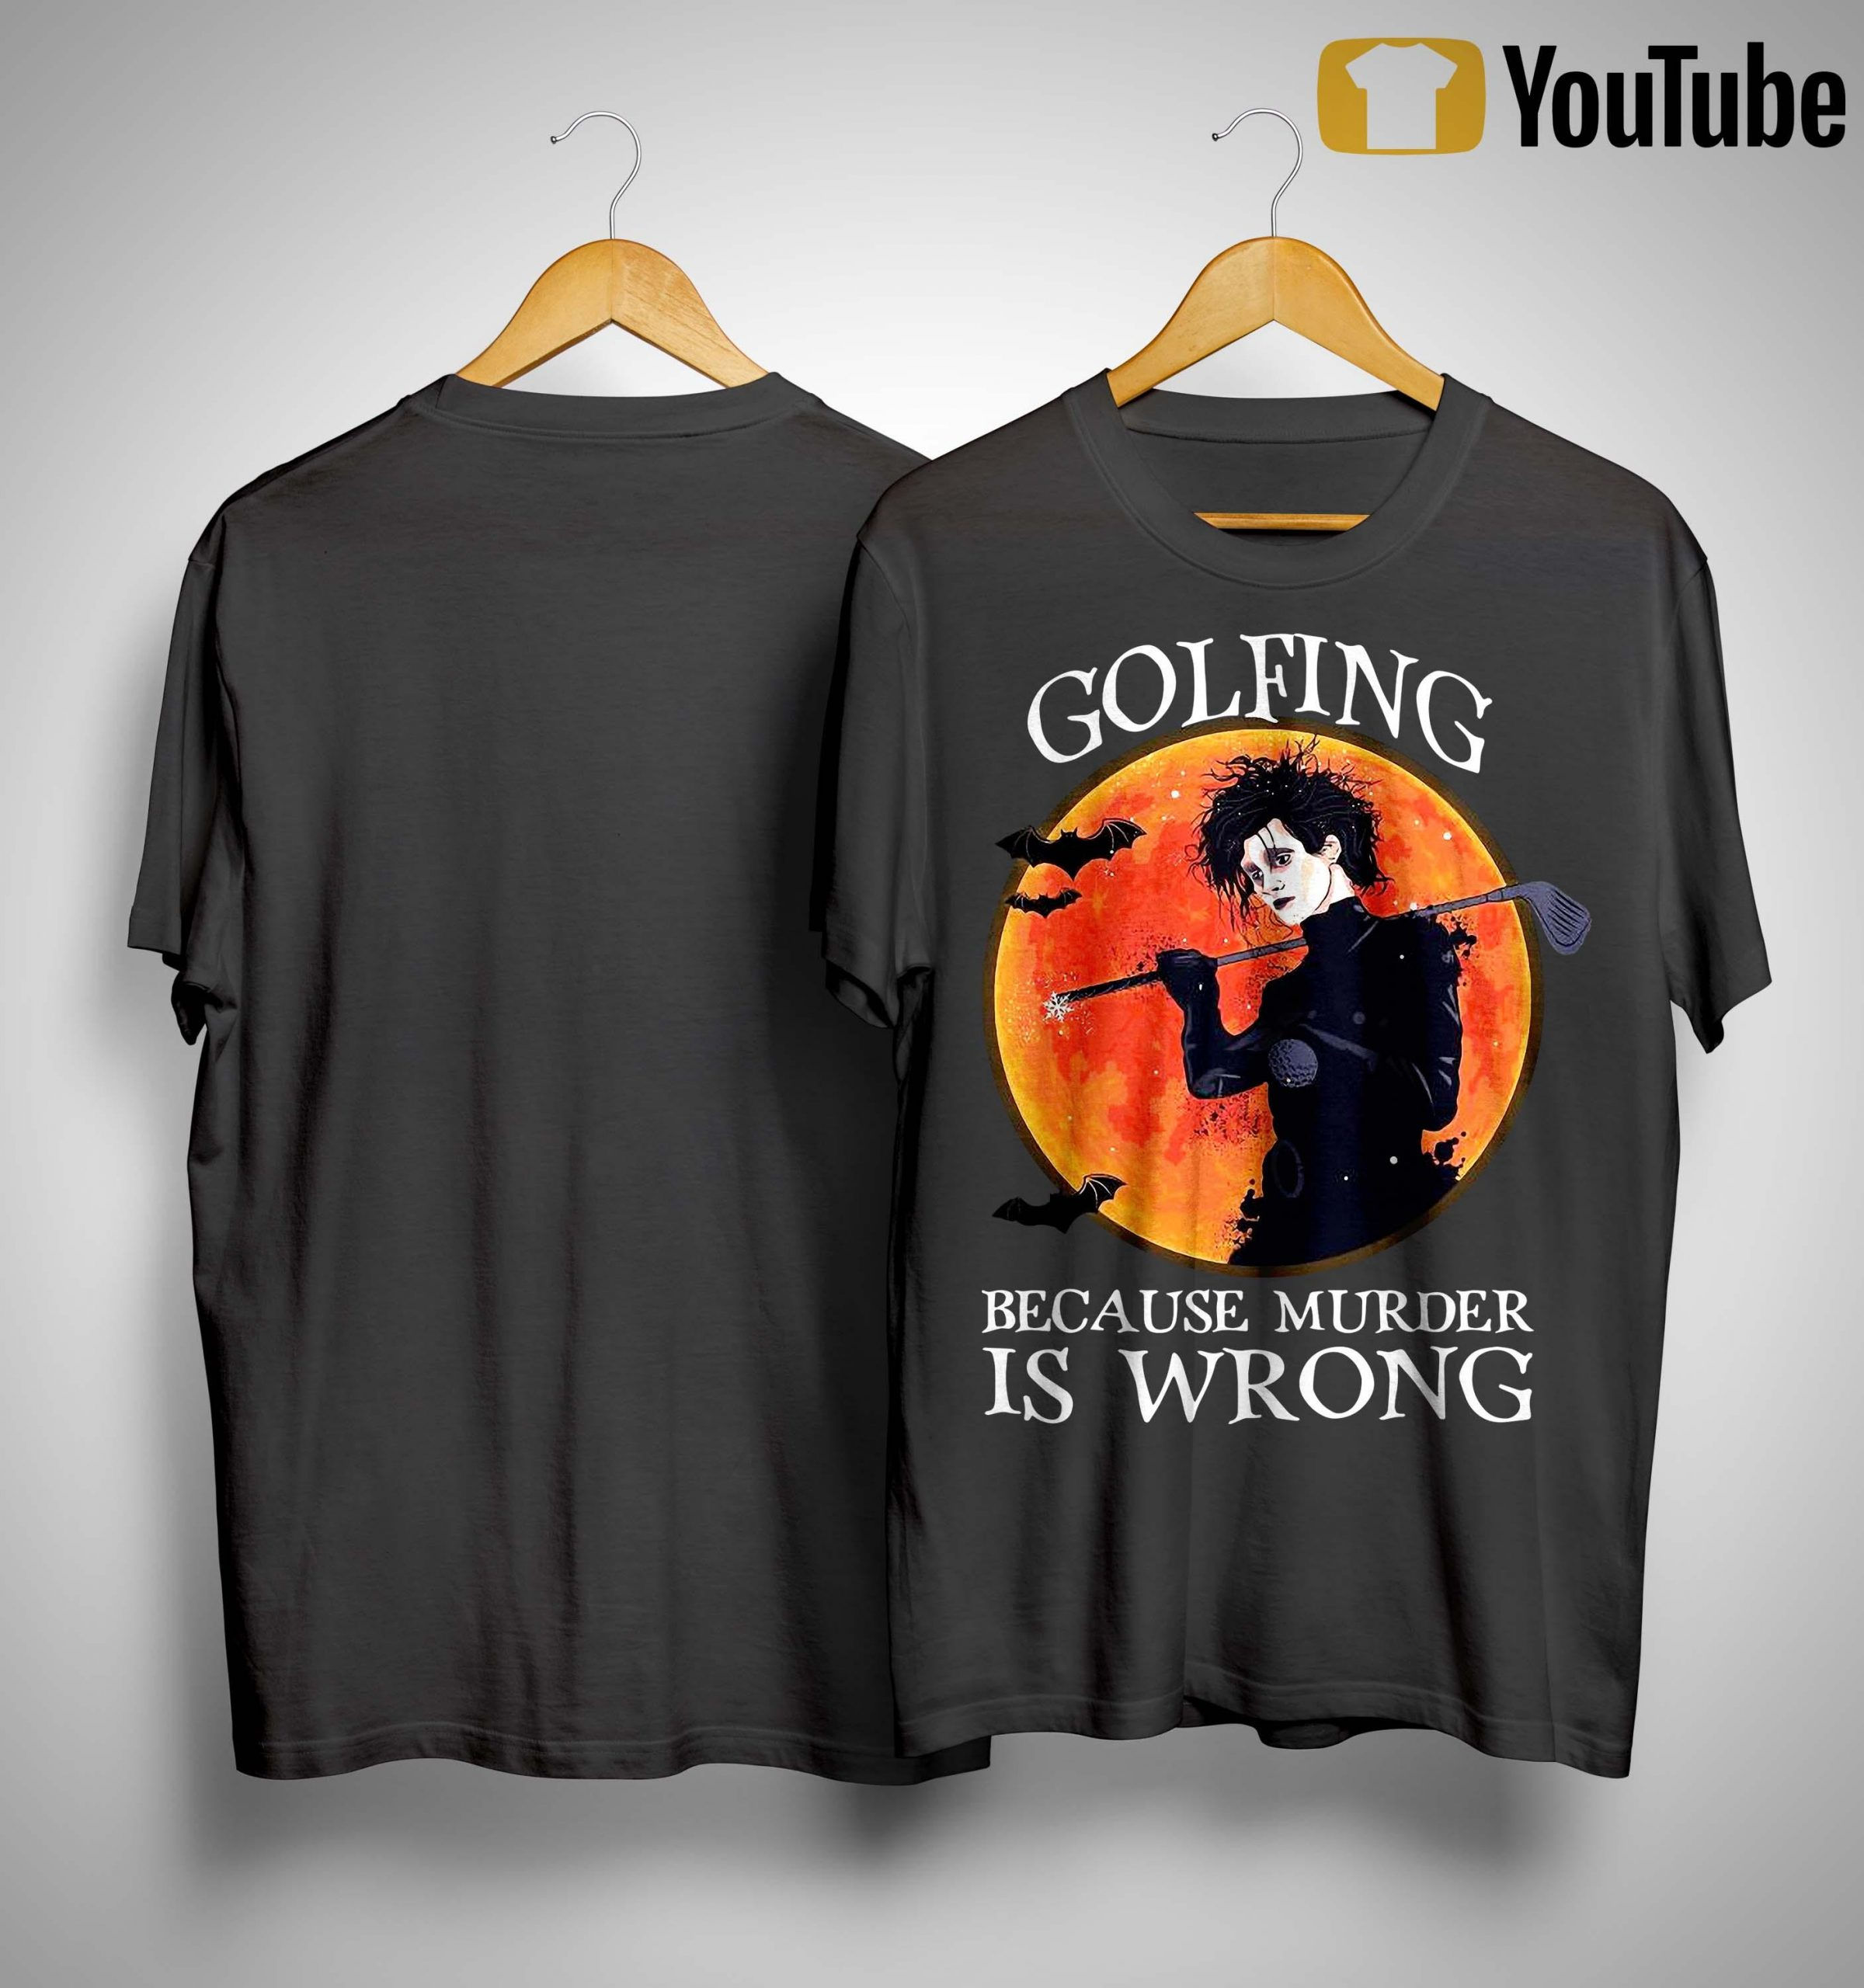 Golfing Because Murder Is Wrong Shirt